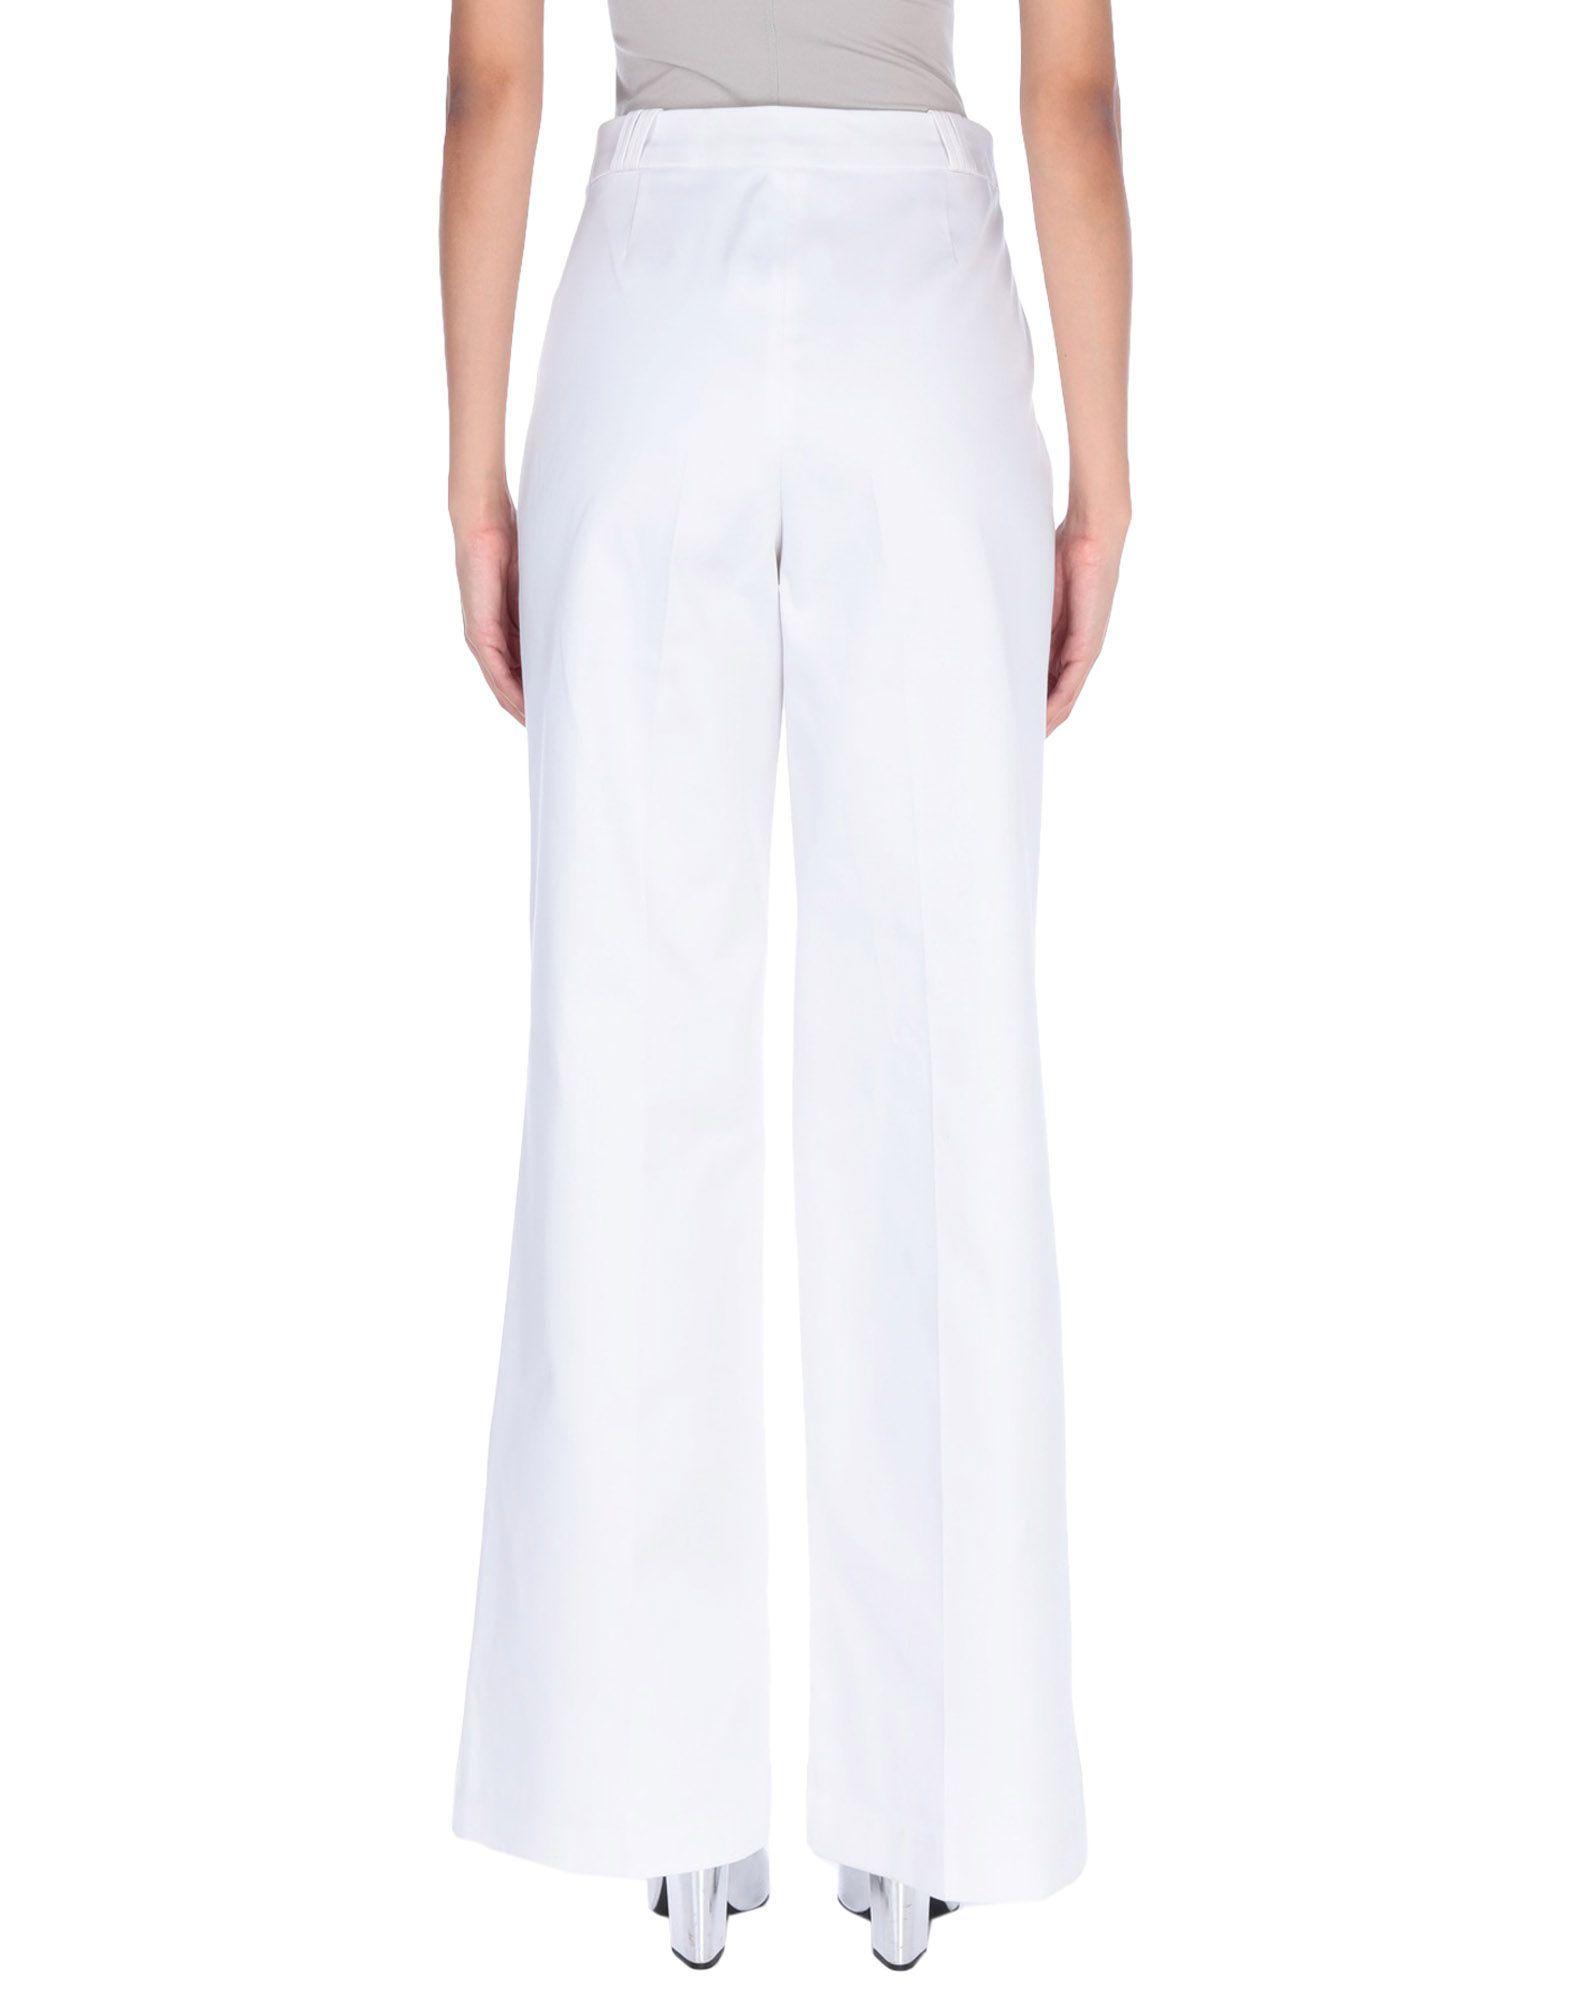 Acne Studios White Cotton Wide Leg Trousers